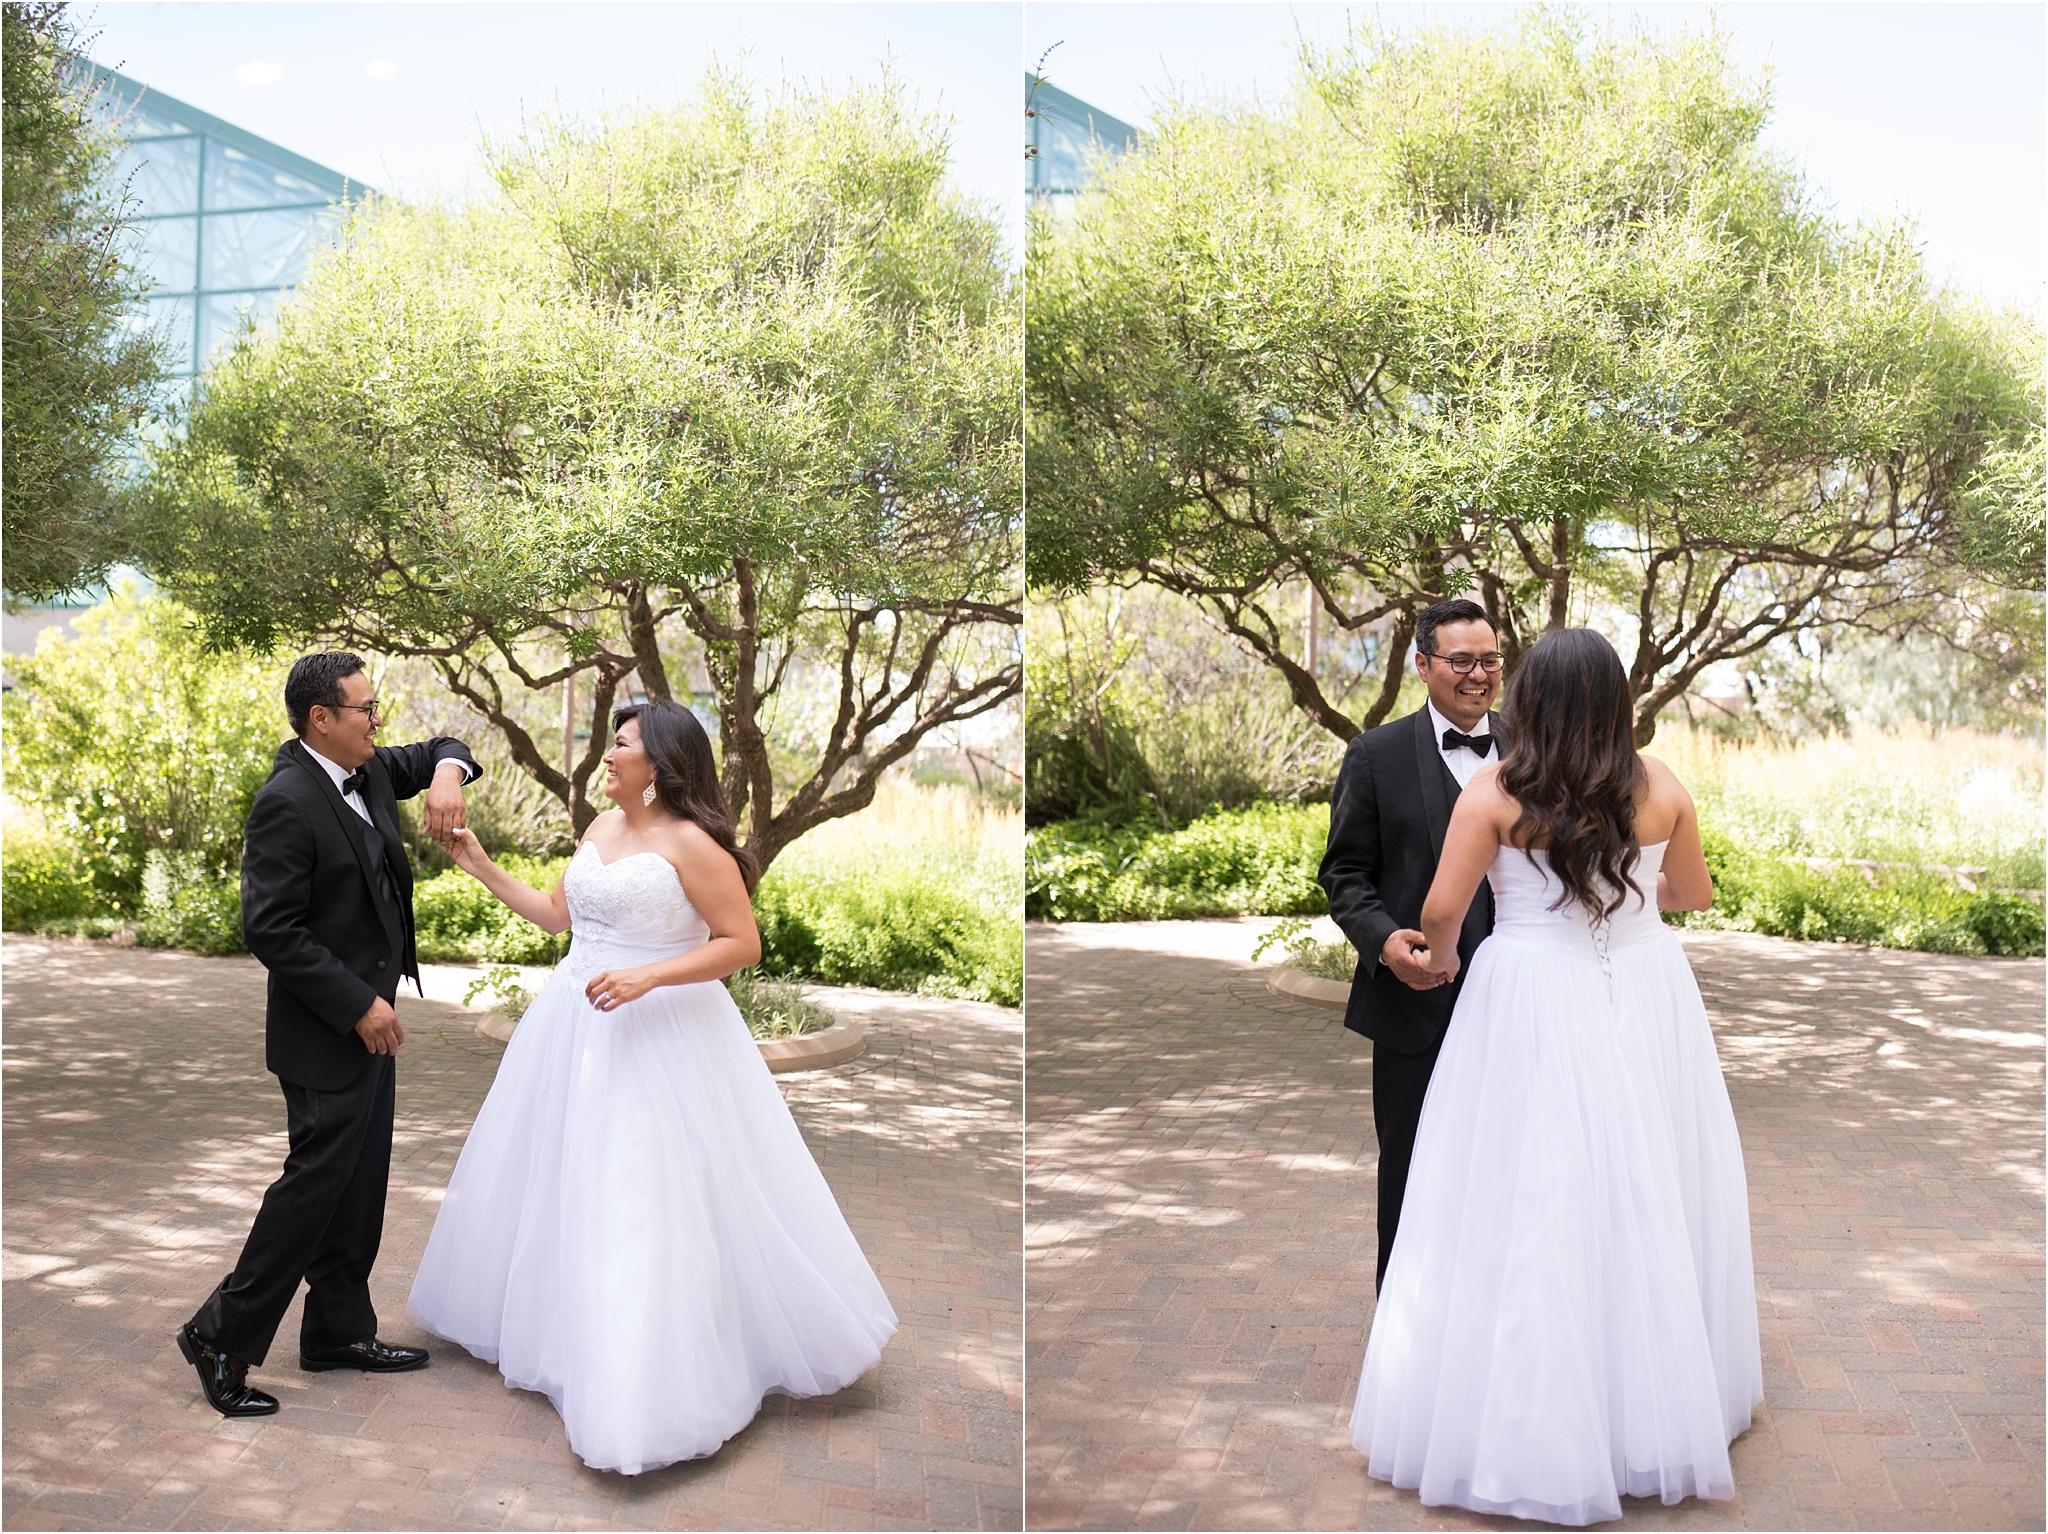 kayla kitts photography - albuquerque botanical gardens - albuquerque wedding photographer - albuquerque wedding - the banque lofts wedding_0015.jpg